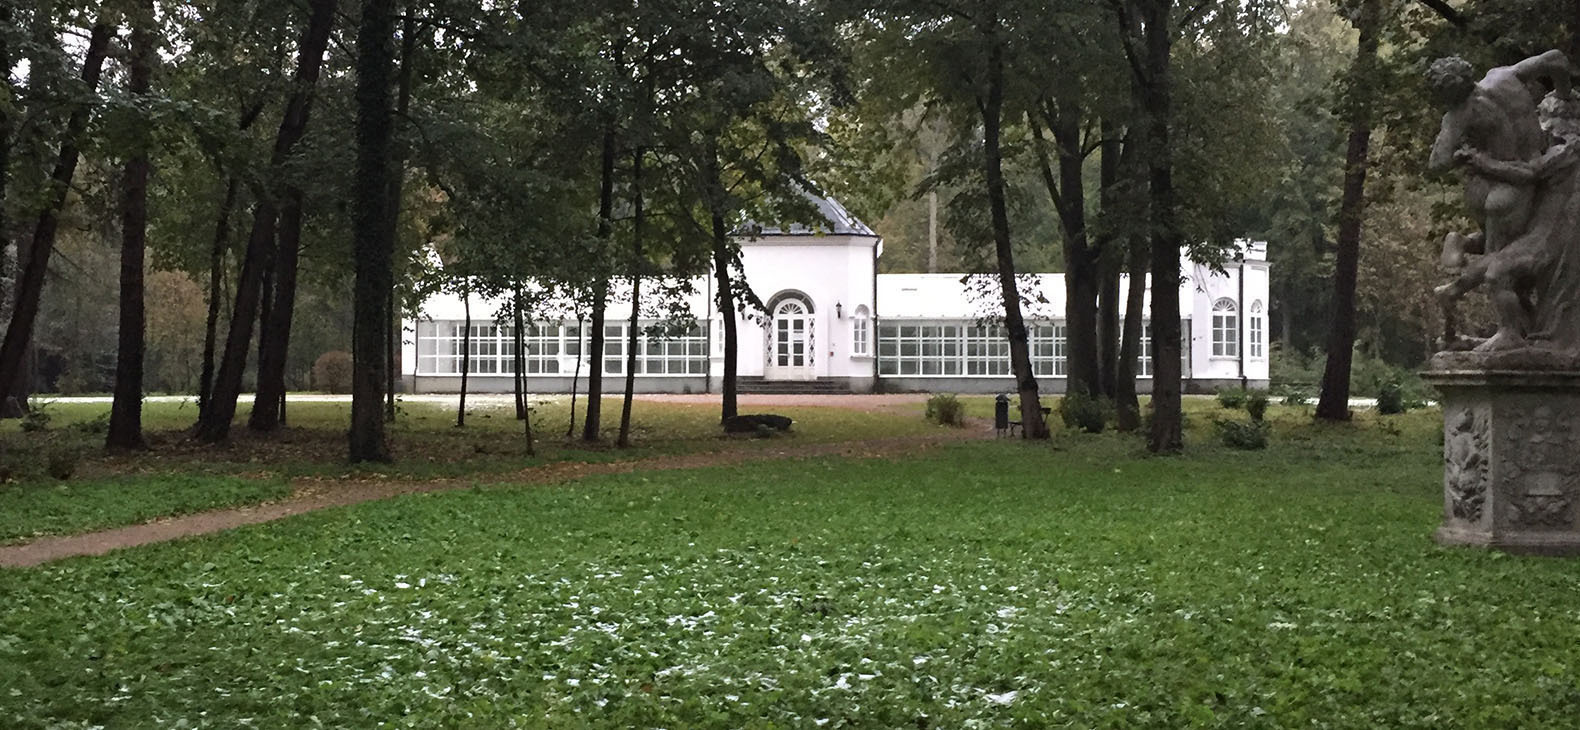 Schafhof Transfer Oronsko Orangerie